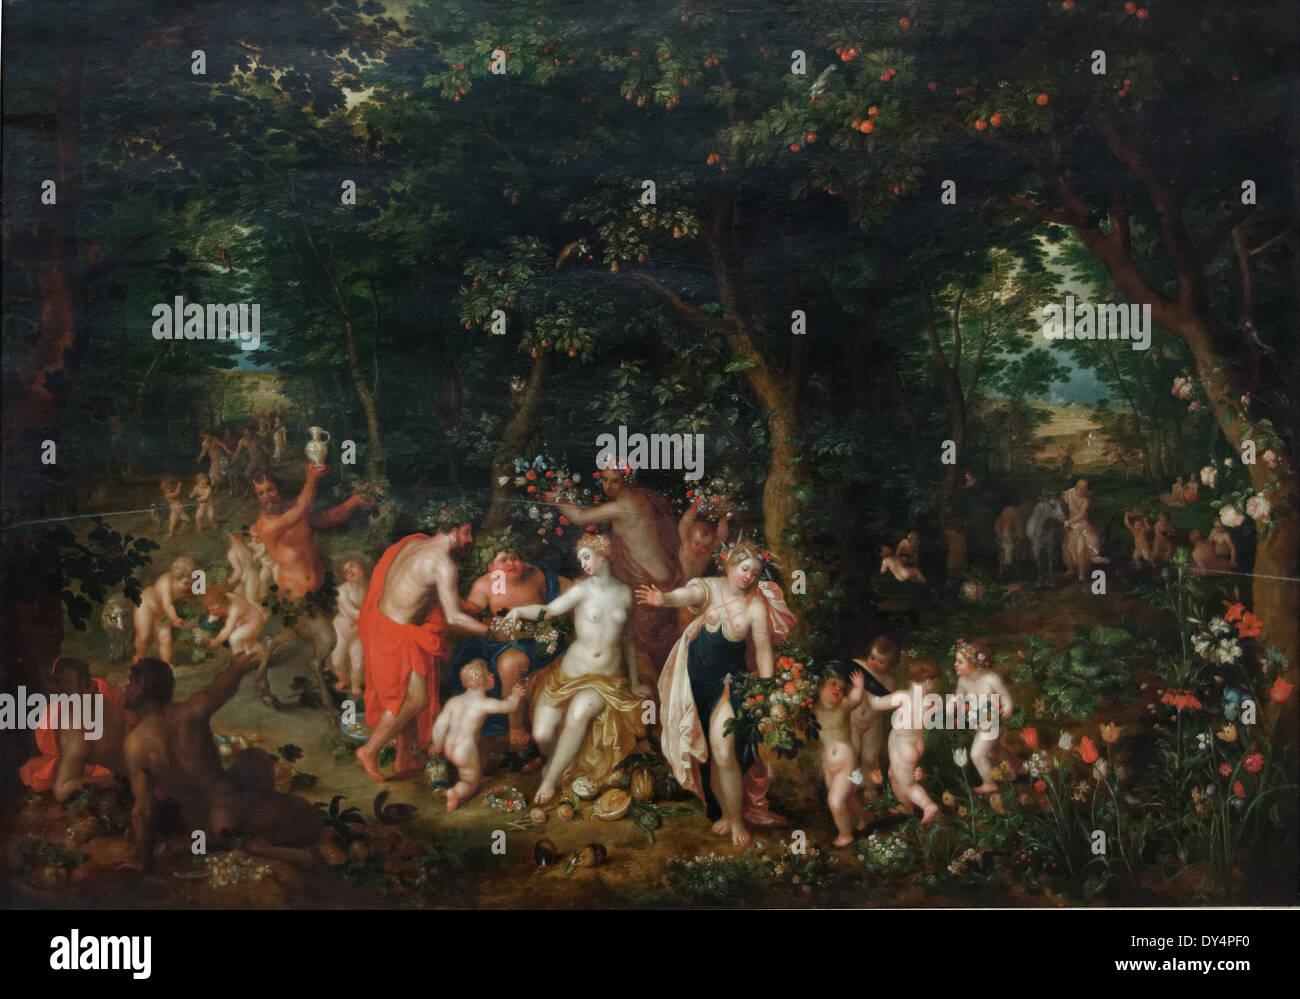 Jan Brueghel the Young - The Feast of Bacchus - XVII th Century - Flemish School - Gemäldegalerie - Berlin Stock Photo